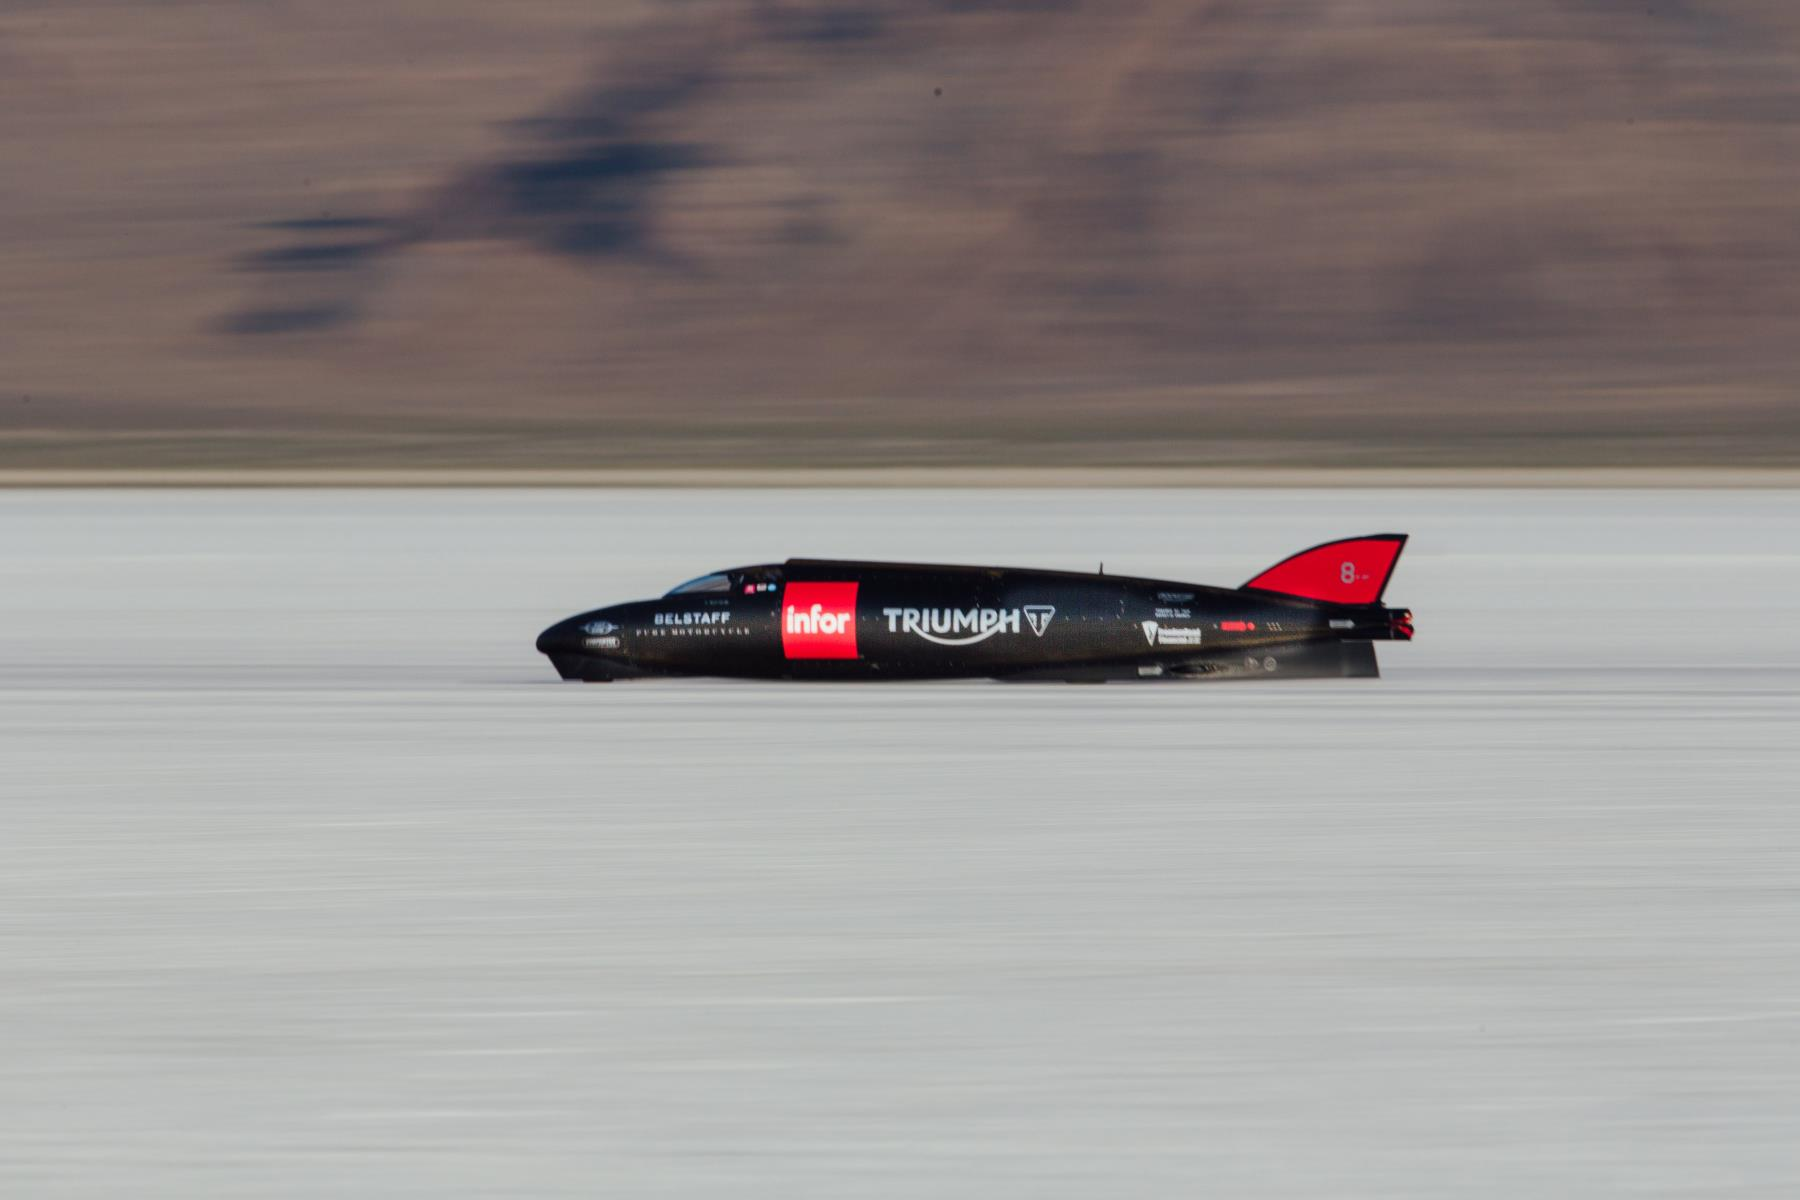 Triumph Infor Rocket Streamliner at Bonneville. [photo courtesy Triumph Motorcycles]